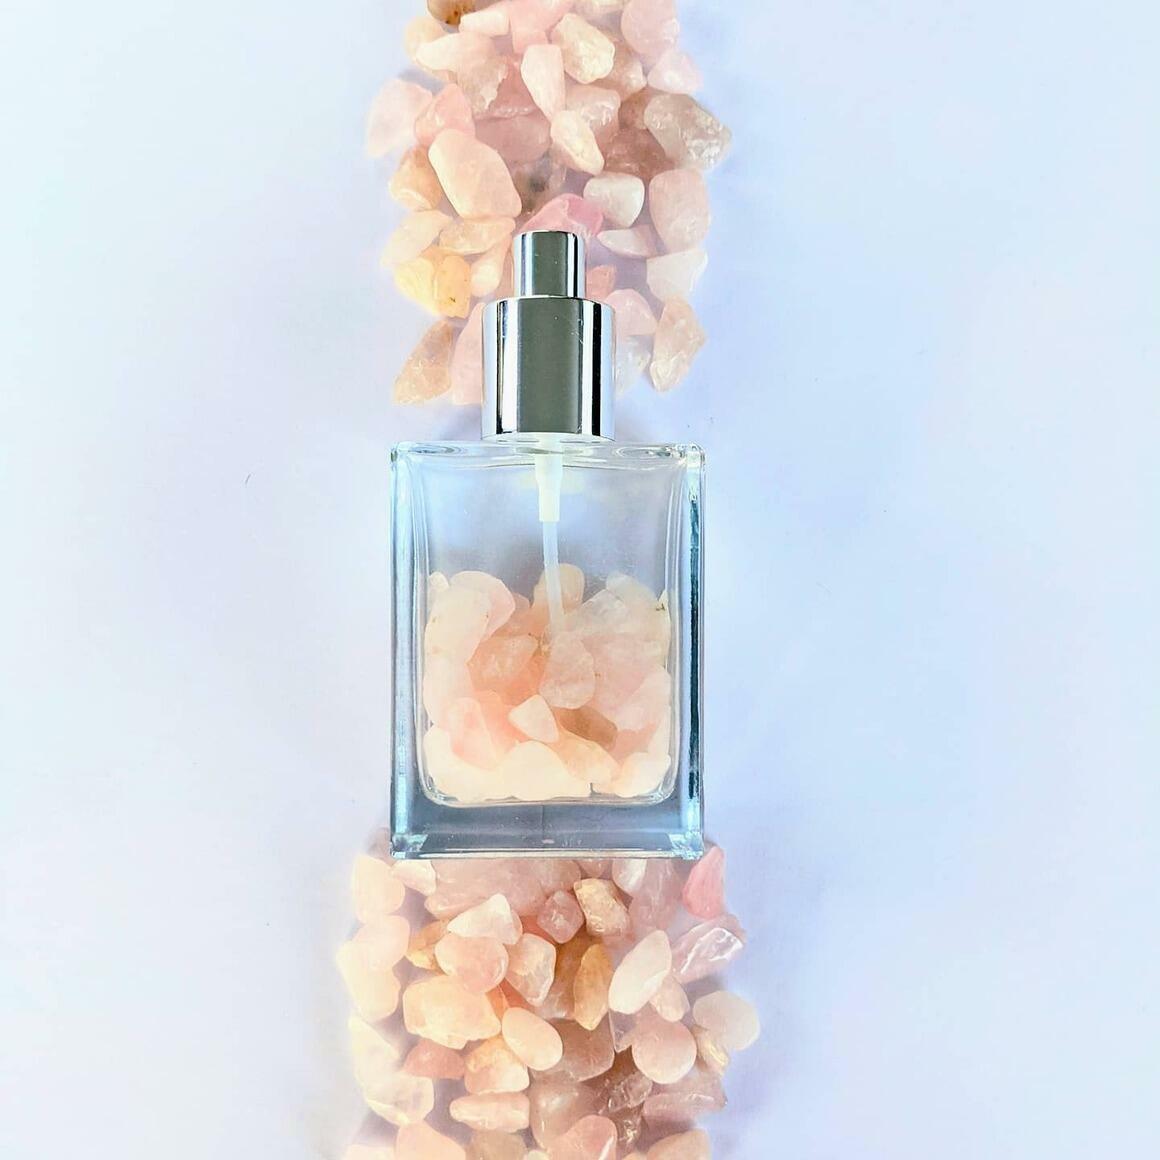 Rose Quartz Crystal infused Body mist 100ml   Trada Marketplace